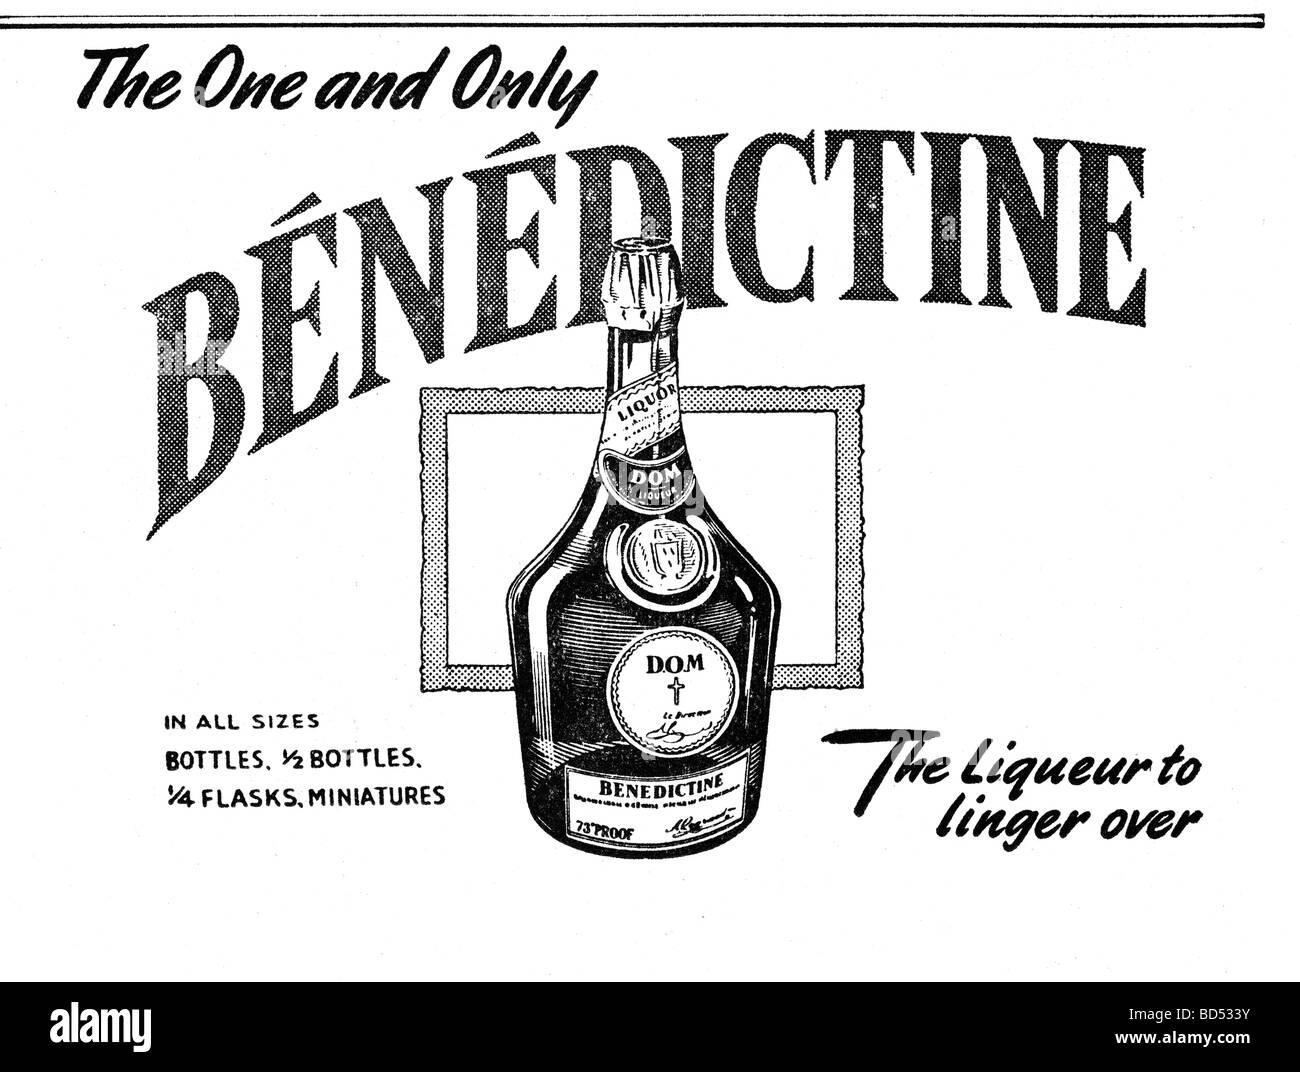 Benedictine liqueur drink advert from 1951 - Stock Image